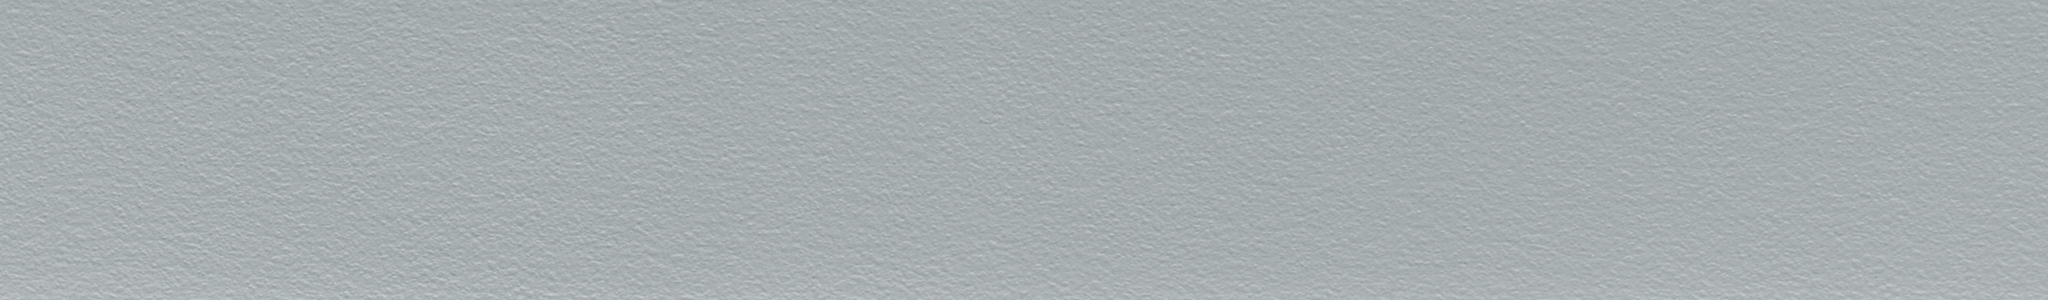 HU 173057 ABS Edge Grey Lava Soft Pearl 107